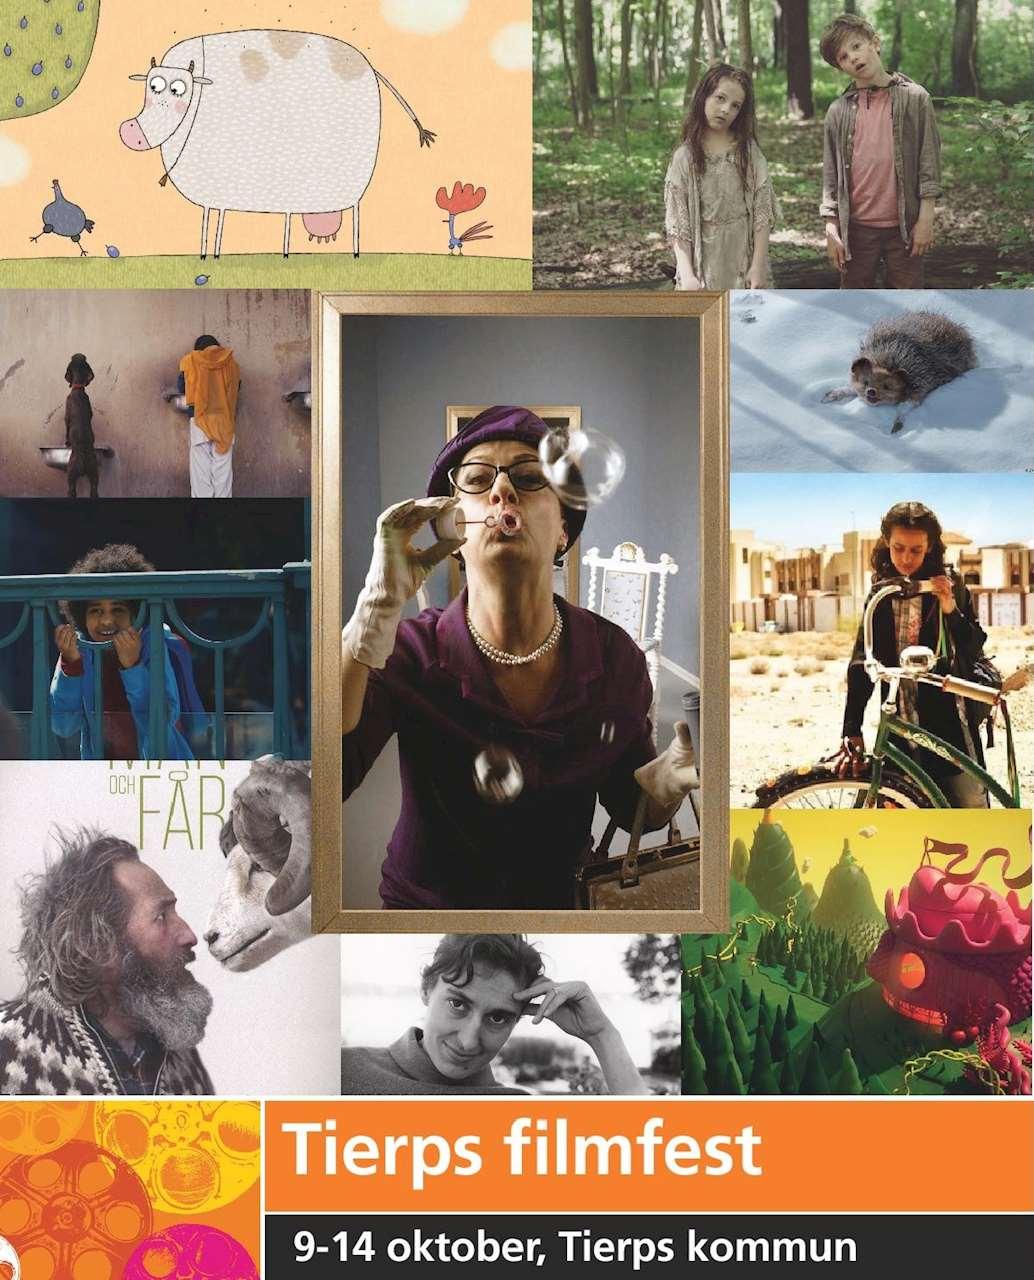 Filmtips 14 oktober